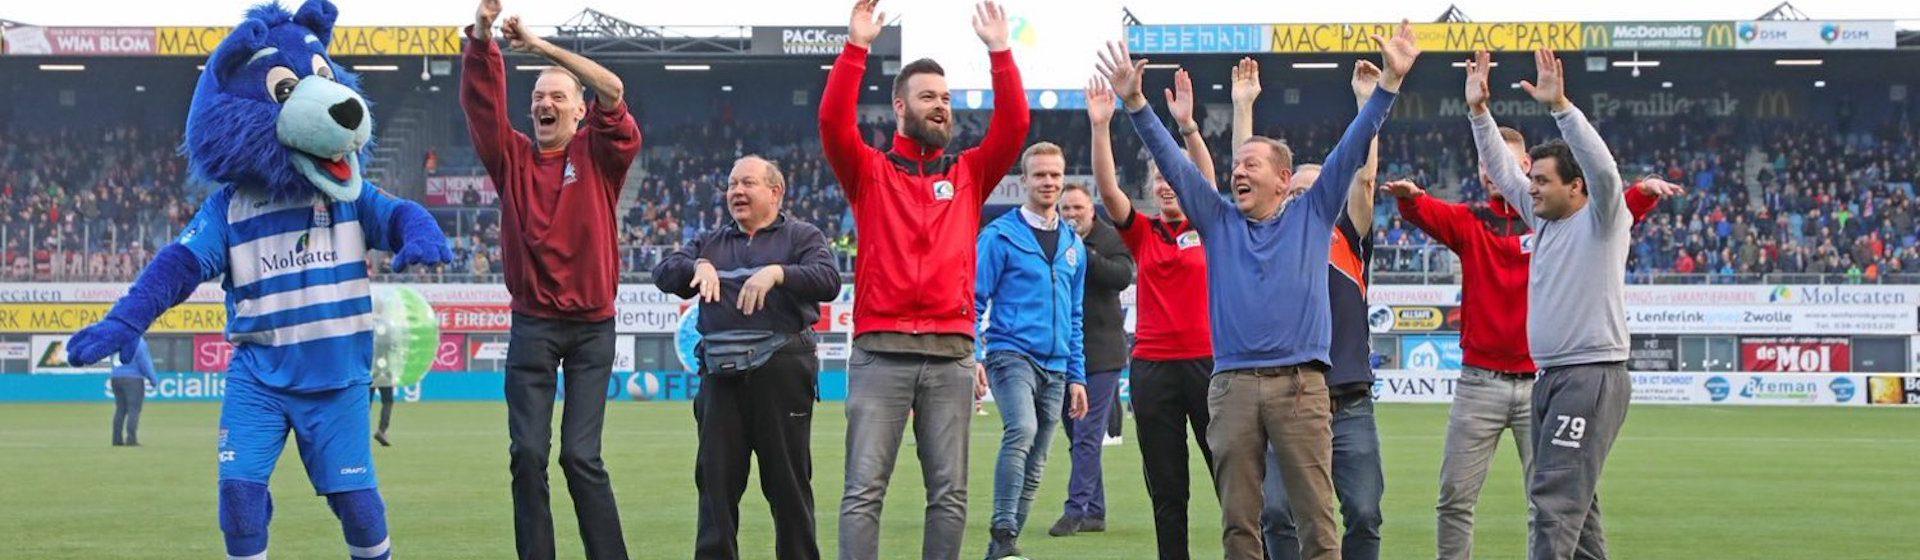 PEC Zwolle United header